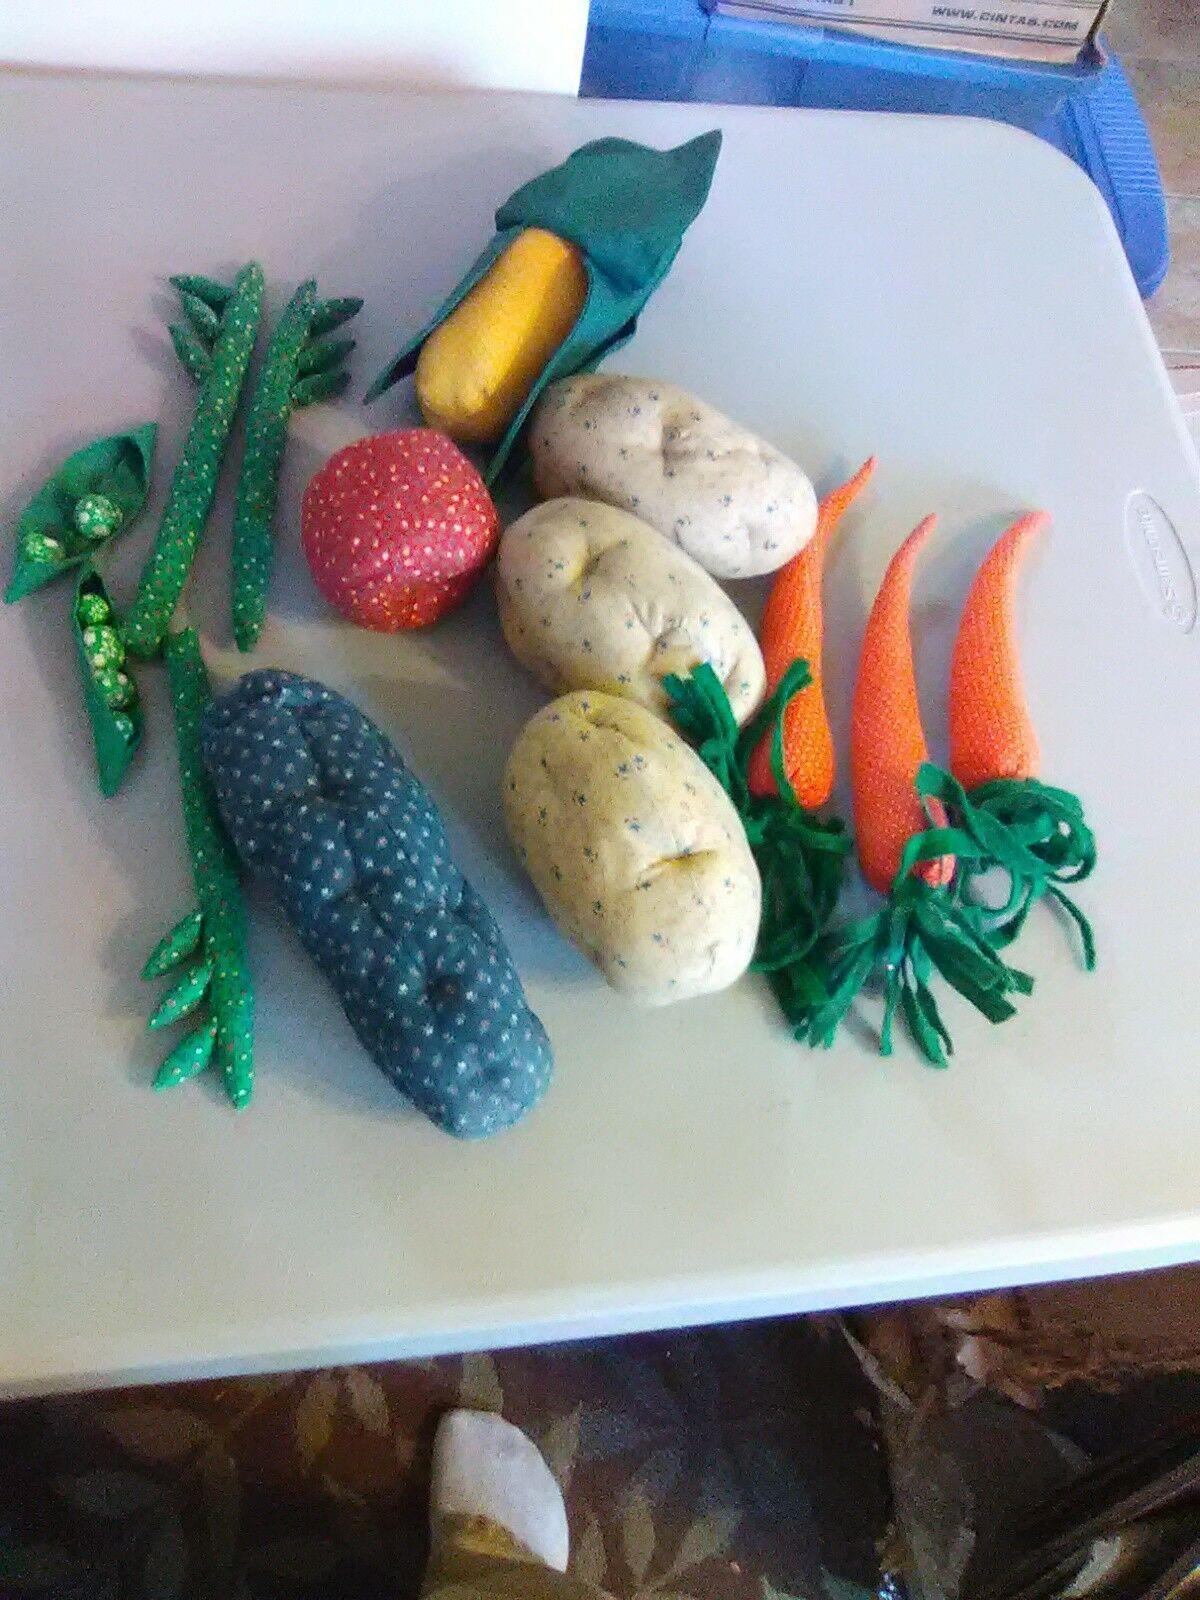 Longaberger Vegetable Sleigh Basket 1995  - Hand sewn vegetables image 2